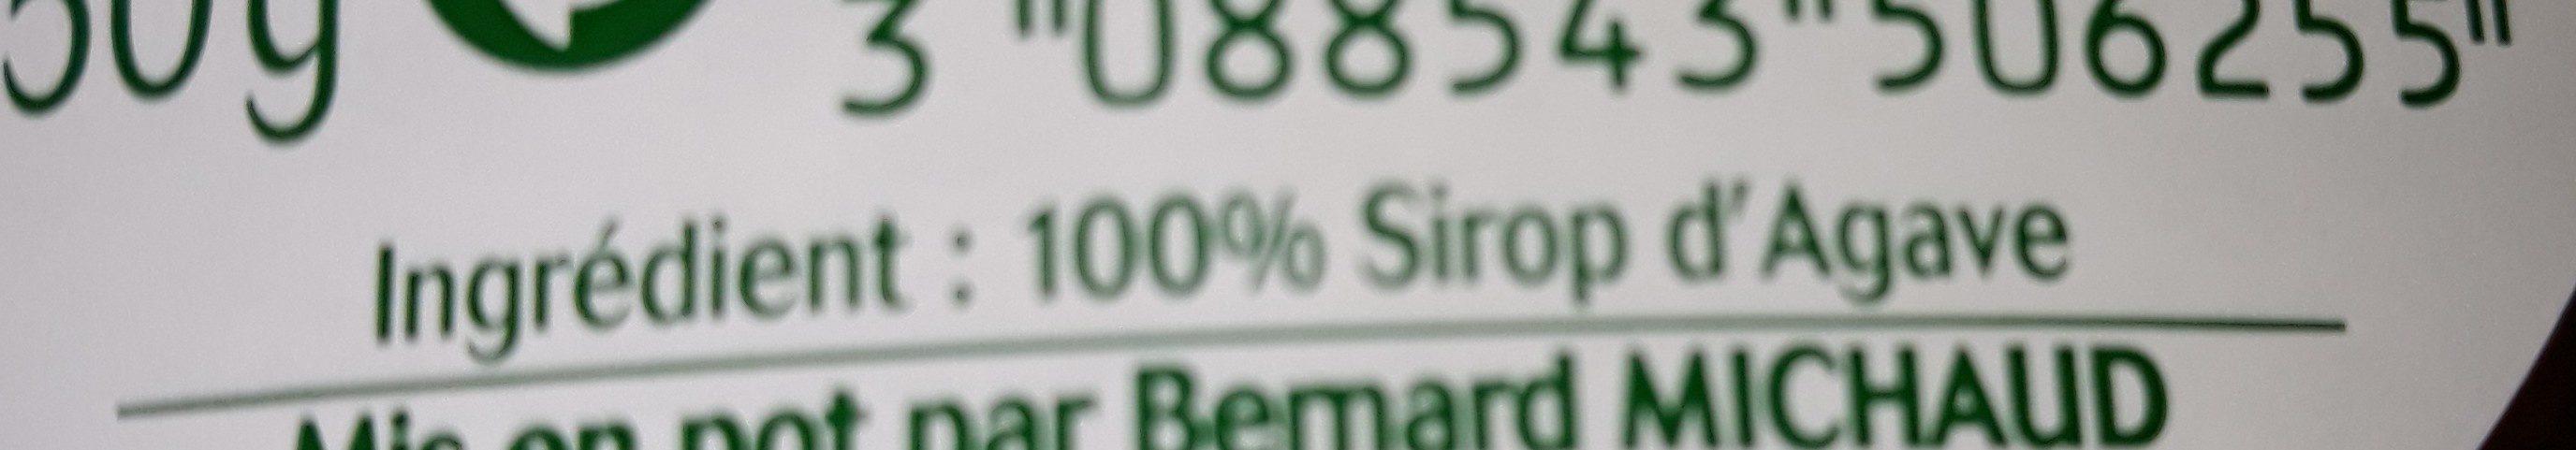 Sirop d'agave - Ingredients - fr